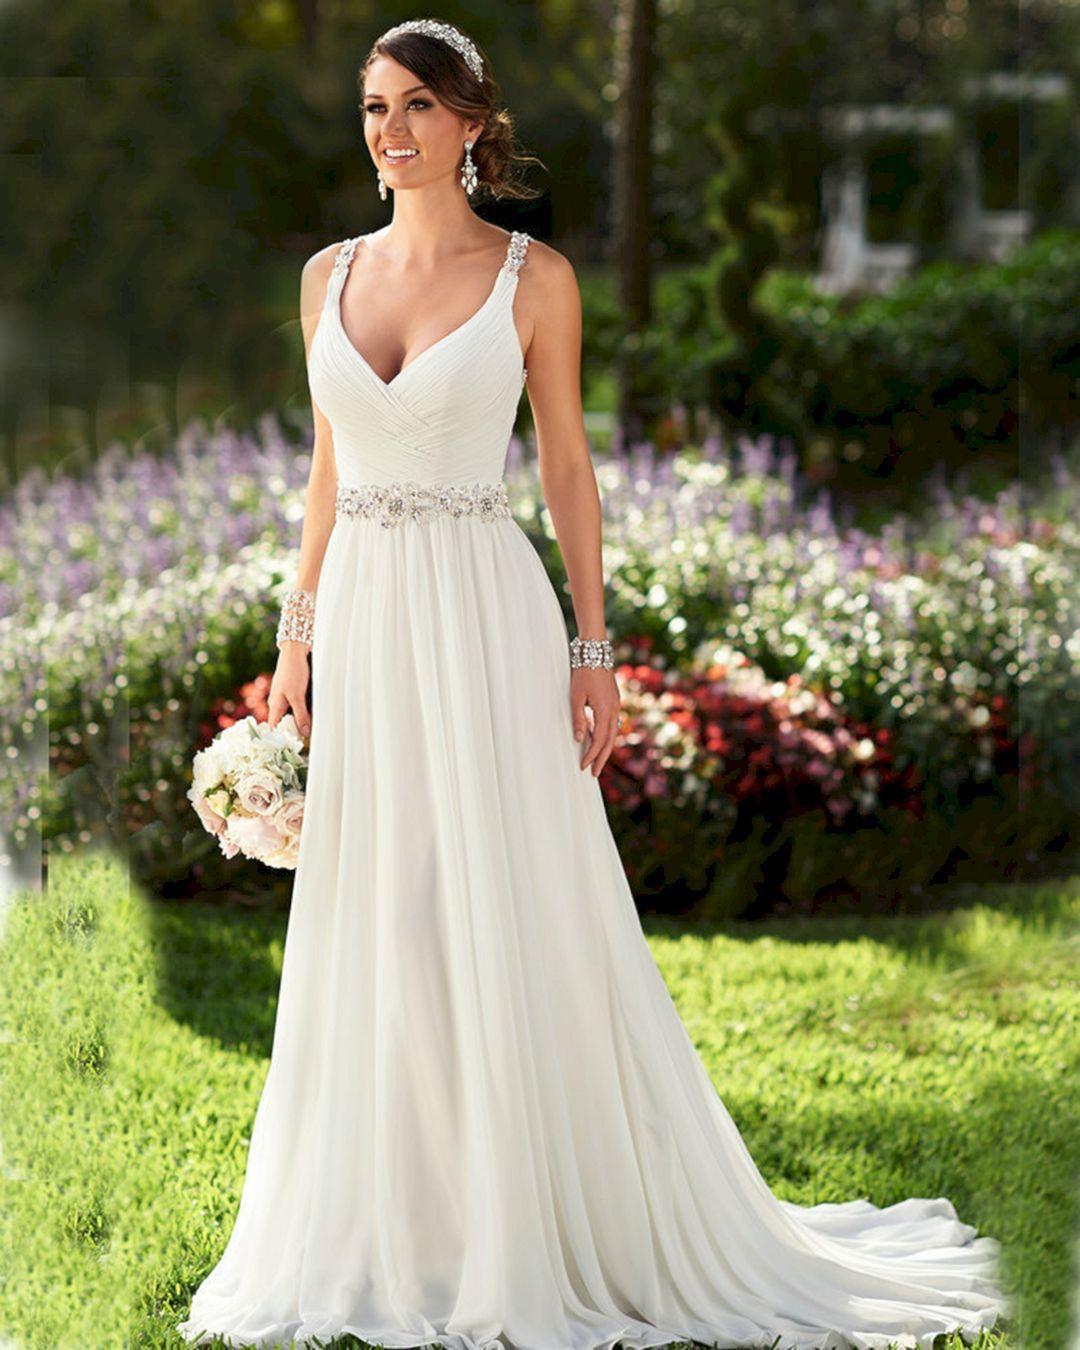 20++ Cheap summer wedding dresses ideas ideas in 2021